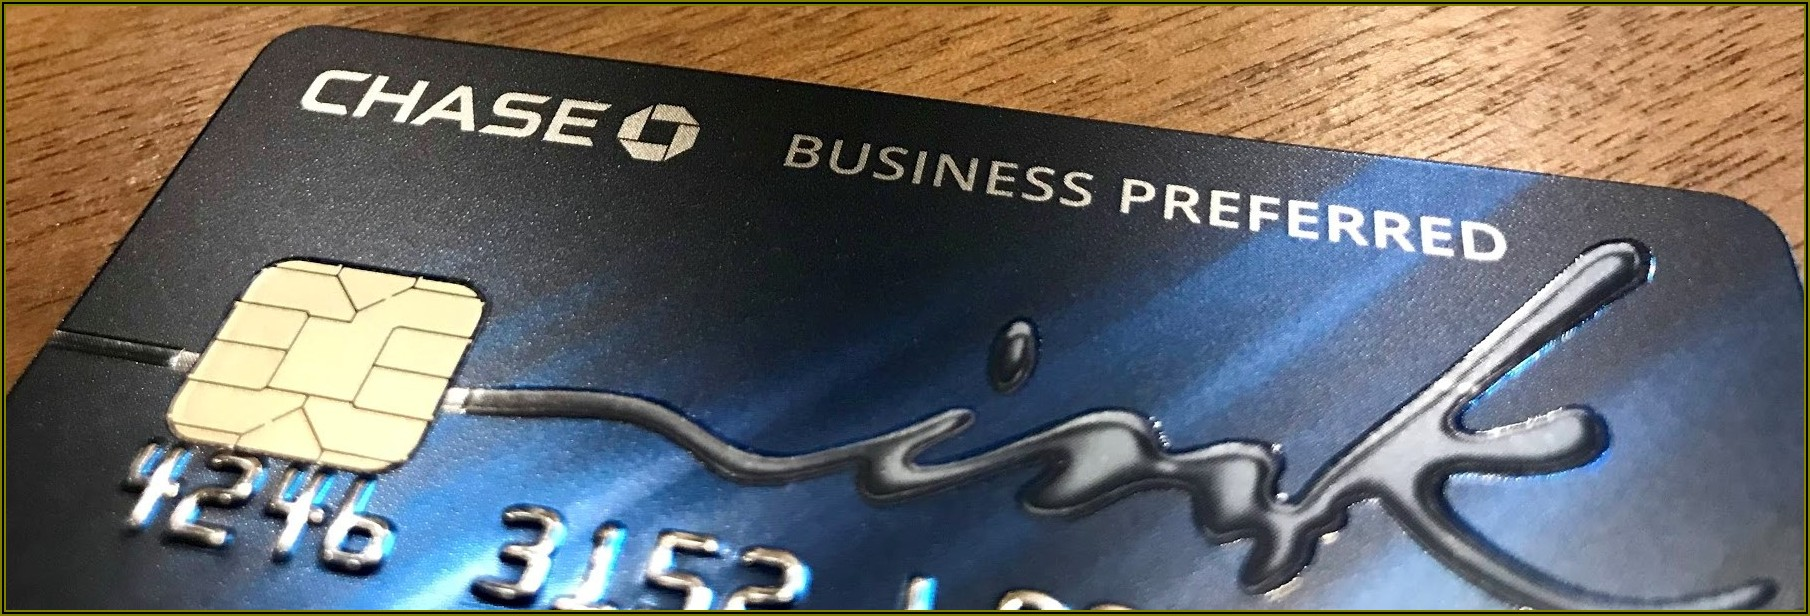 Ink Business Preferredsm Credit Card Benefits